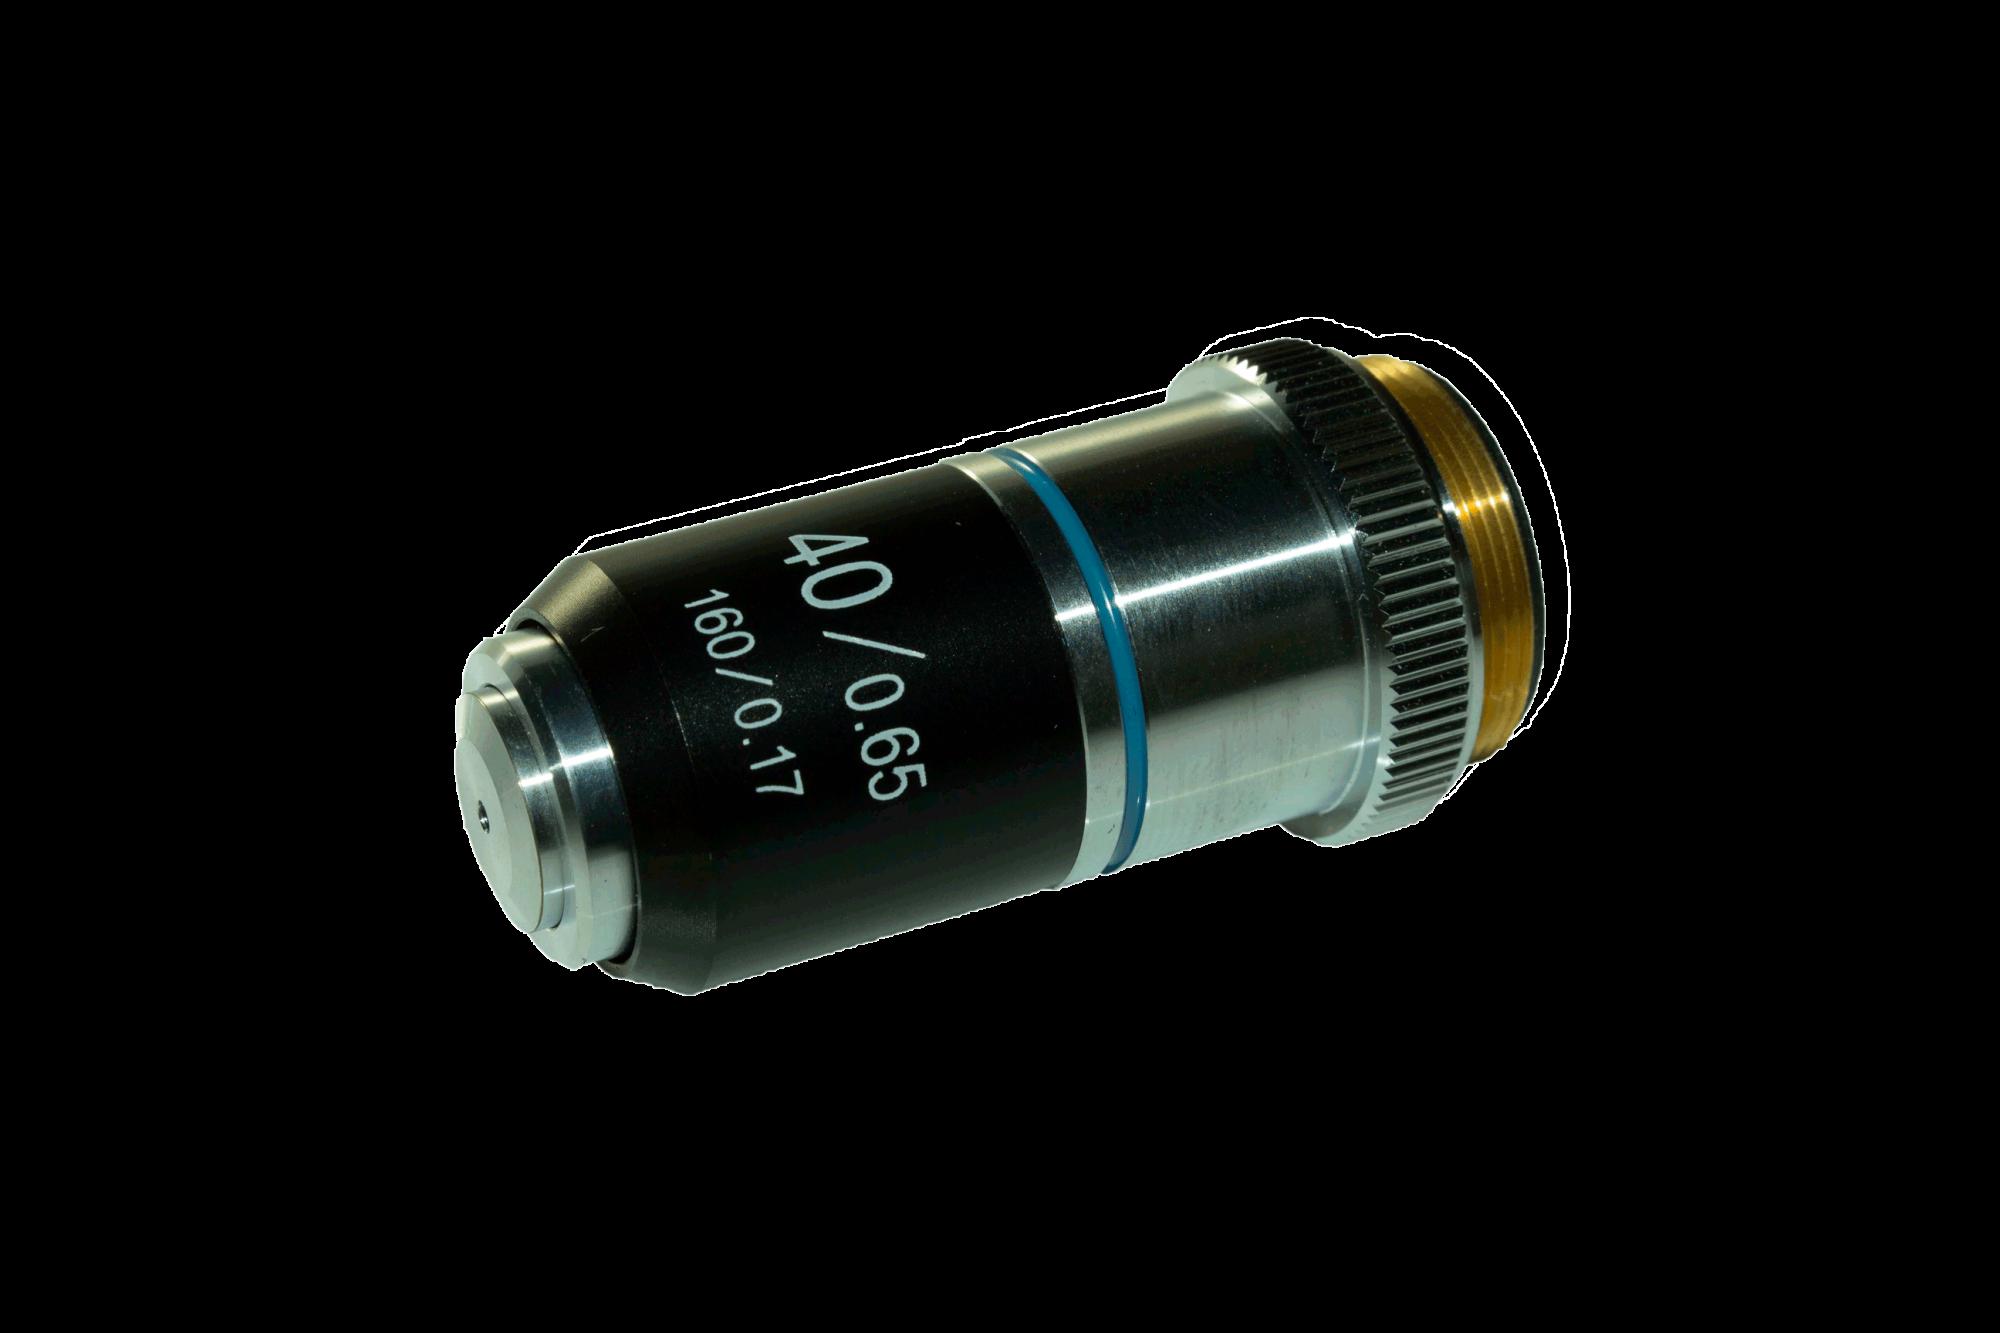 Lente Objetiva para Microscópio BEL Acromática 40x 160MM